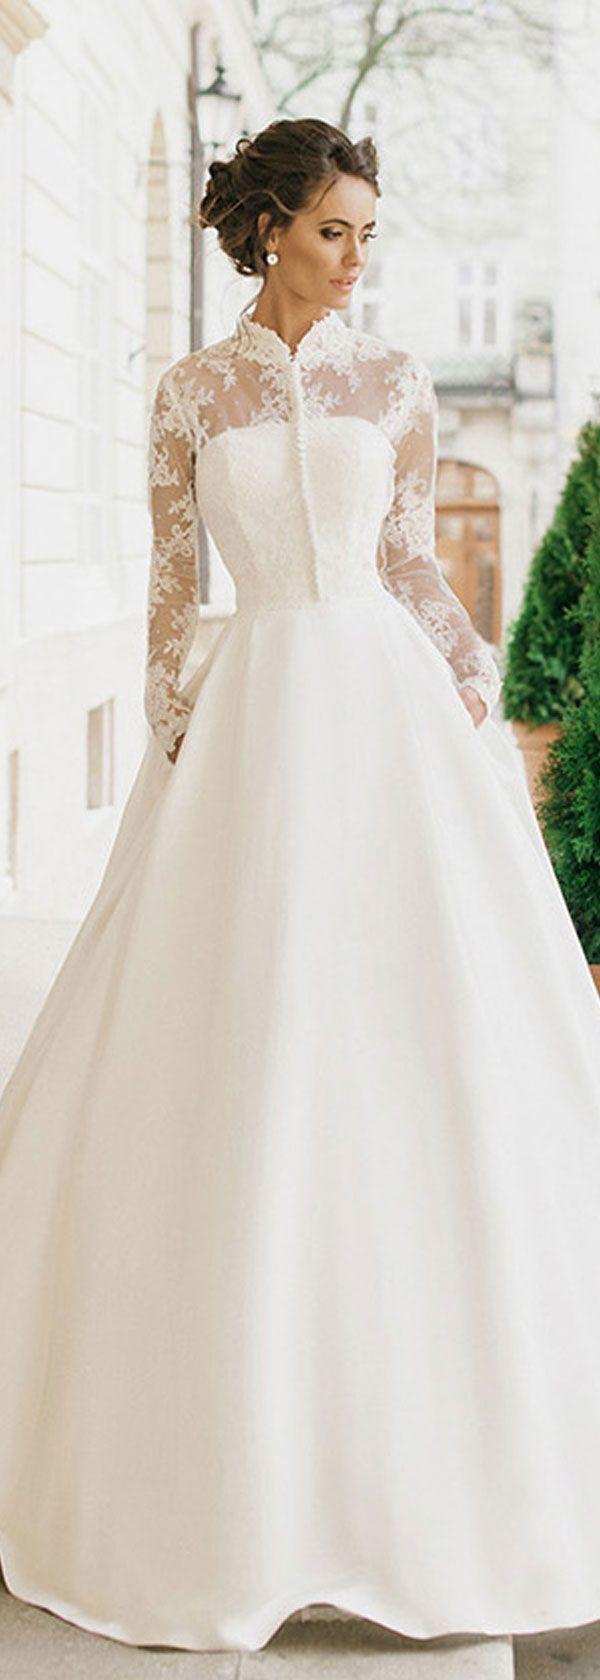 [386.99] Gorgeous Satin High Collar Neckline A-line Wedding Dresses With Detachable Jacket